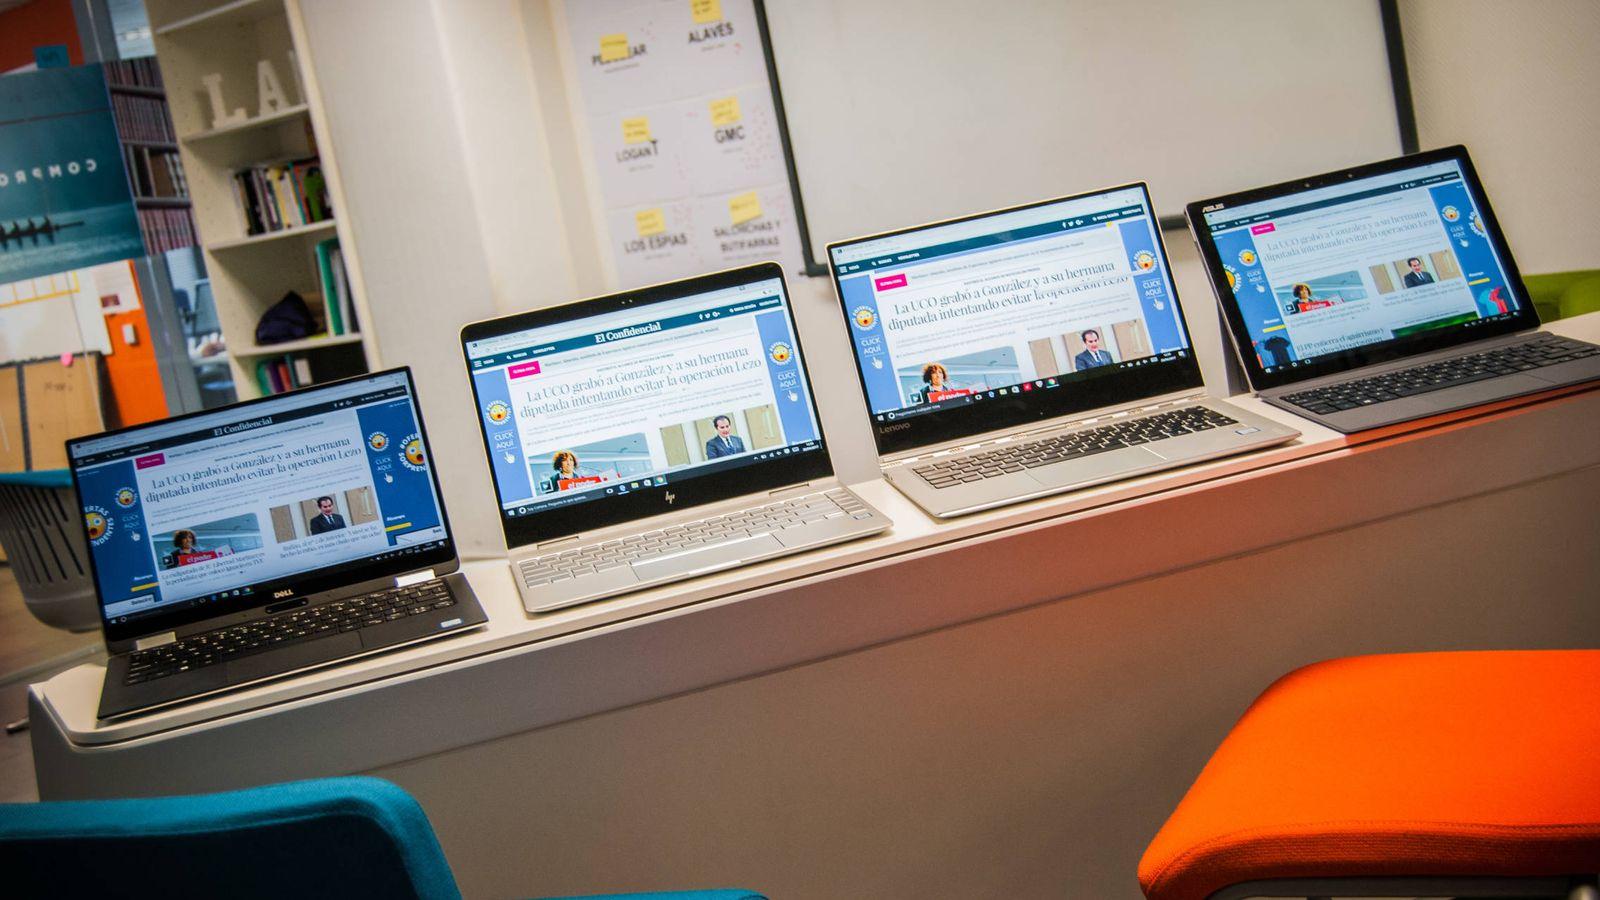 Foto: De izquierda a derecha: Dell XPS 13, HP Spectre x360, Lenovo Yoga 910 y Asus Transformer Pro 3. (Carmen Castellón)